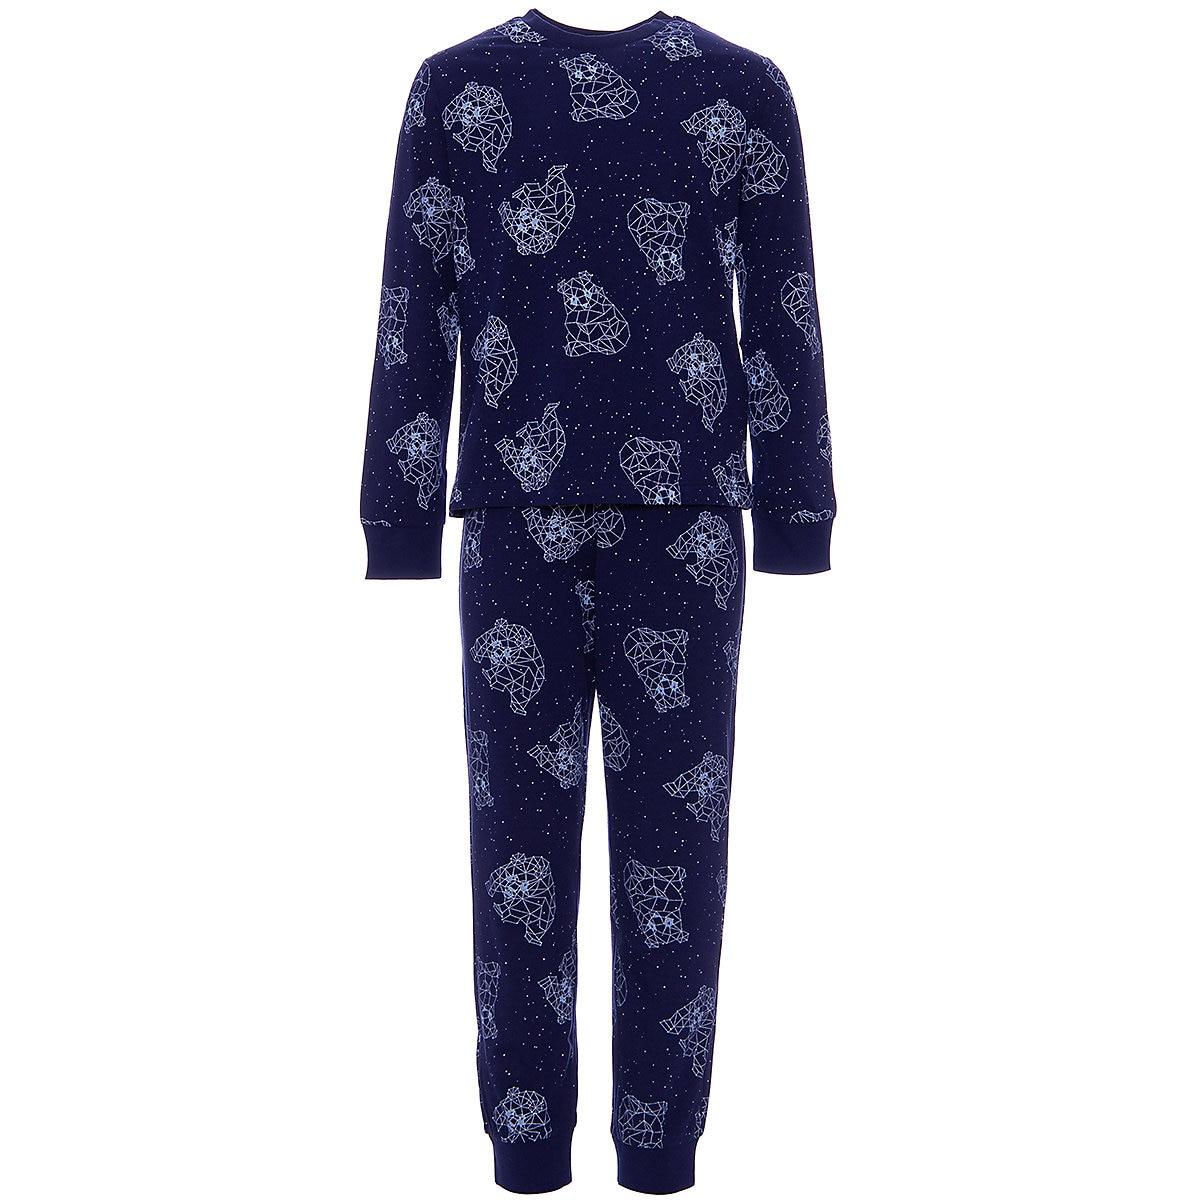 ORIGINAL MARINES Pajama Sets 9500991 Cotton Boys childrens clothing Sleepwear Robe parrot print cami pajama set with robe